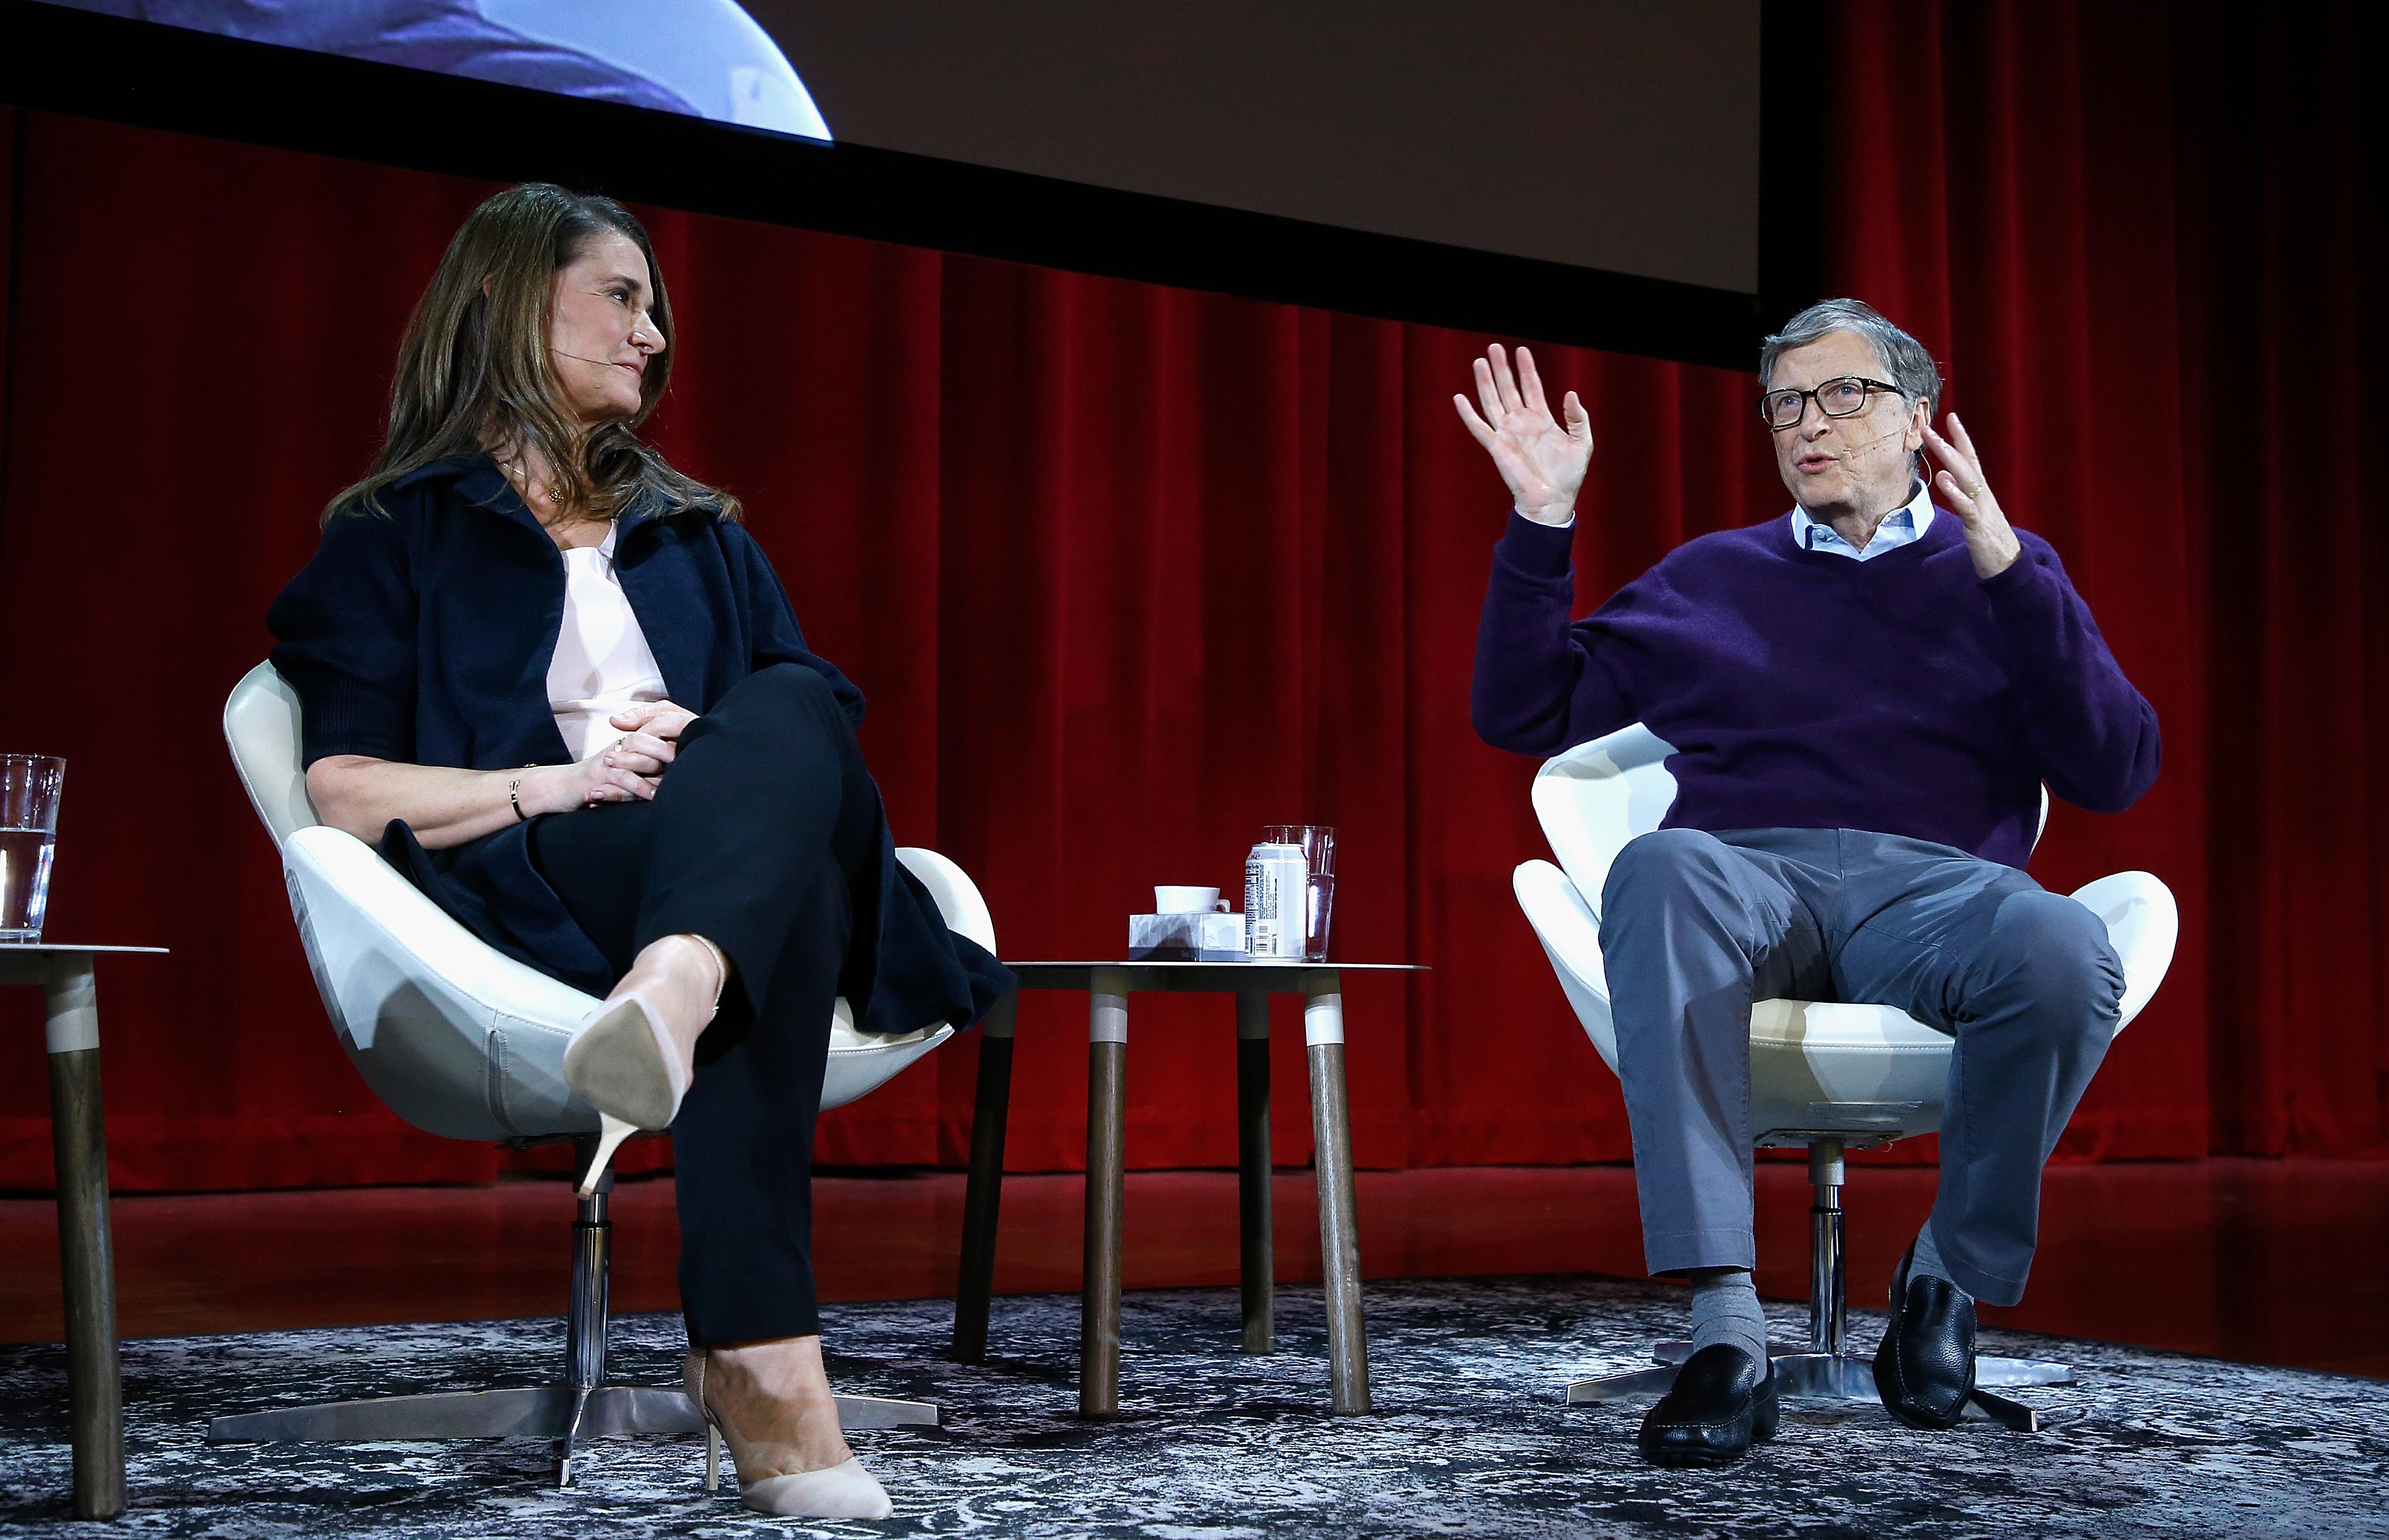 Melinda Gates and Bill Gates speak at Hunter College